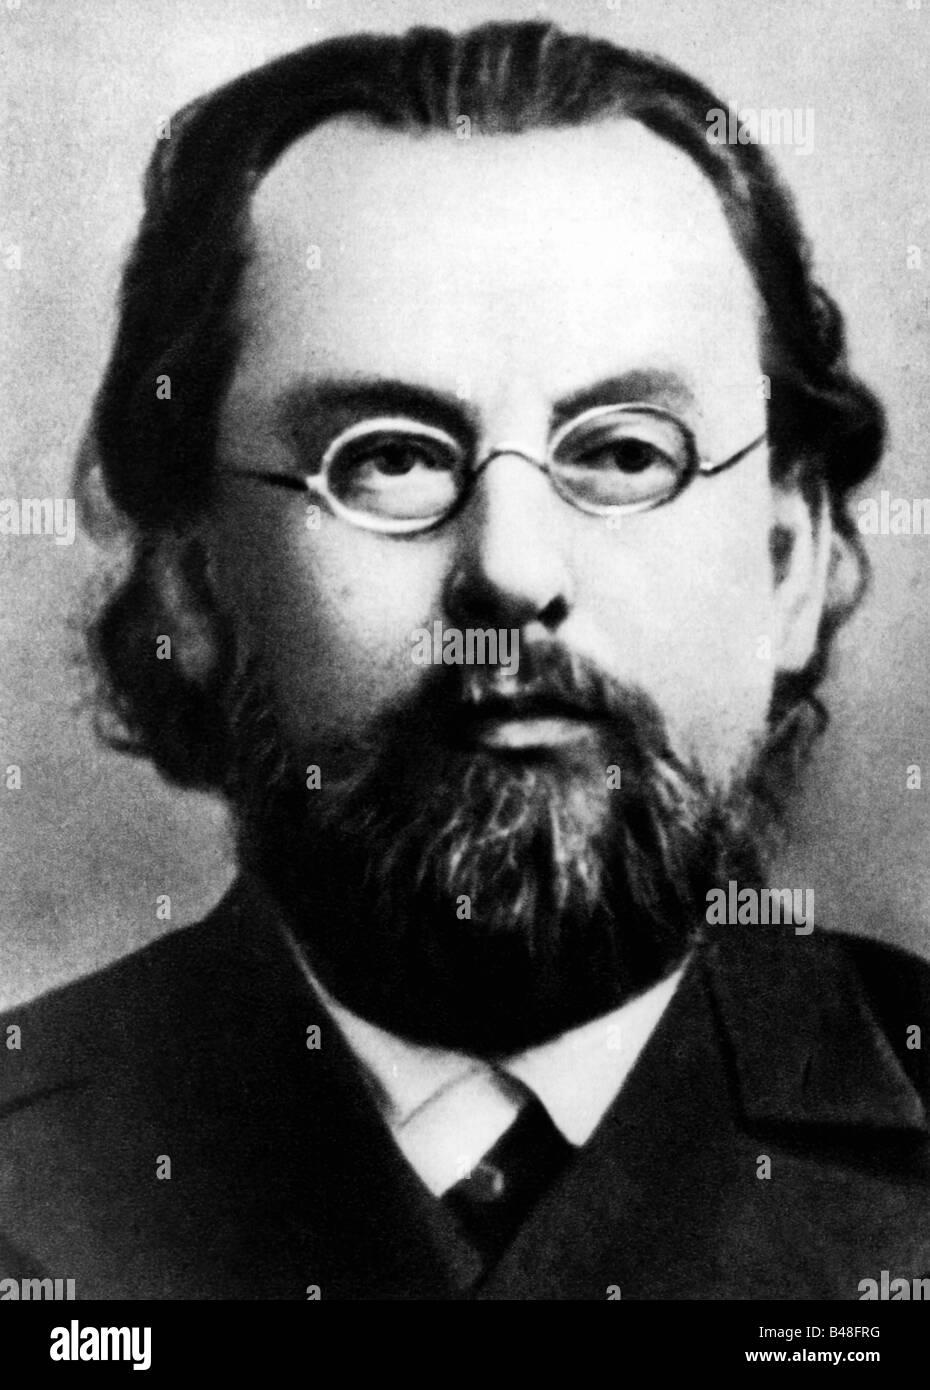 Tsiolkovsky, Konstantin Eduardovich, 17.9.1857 - 19.9.1935, russischer Physiker, Mathematikwissenschaftler, Porträt, Stockfoto